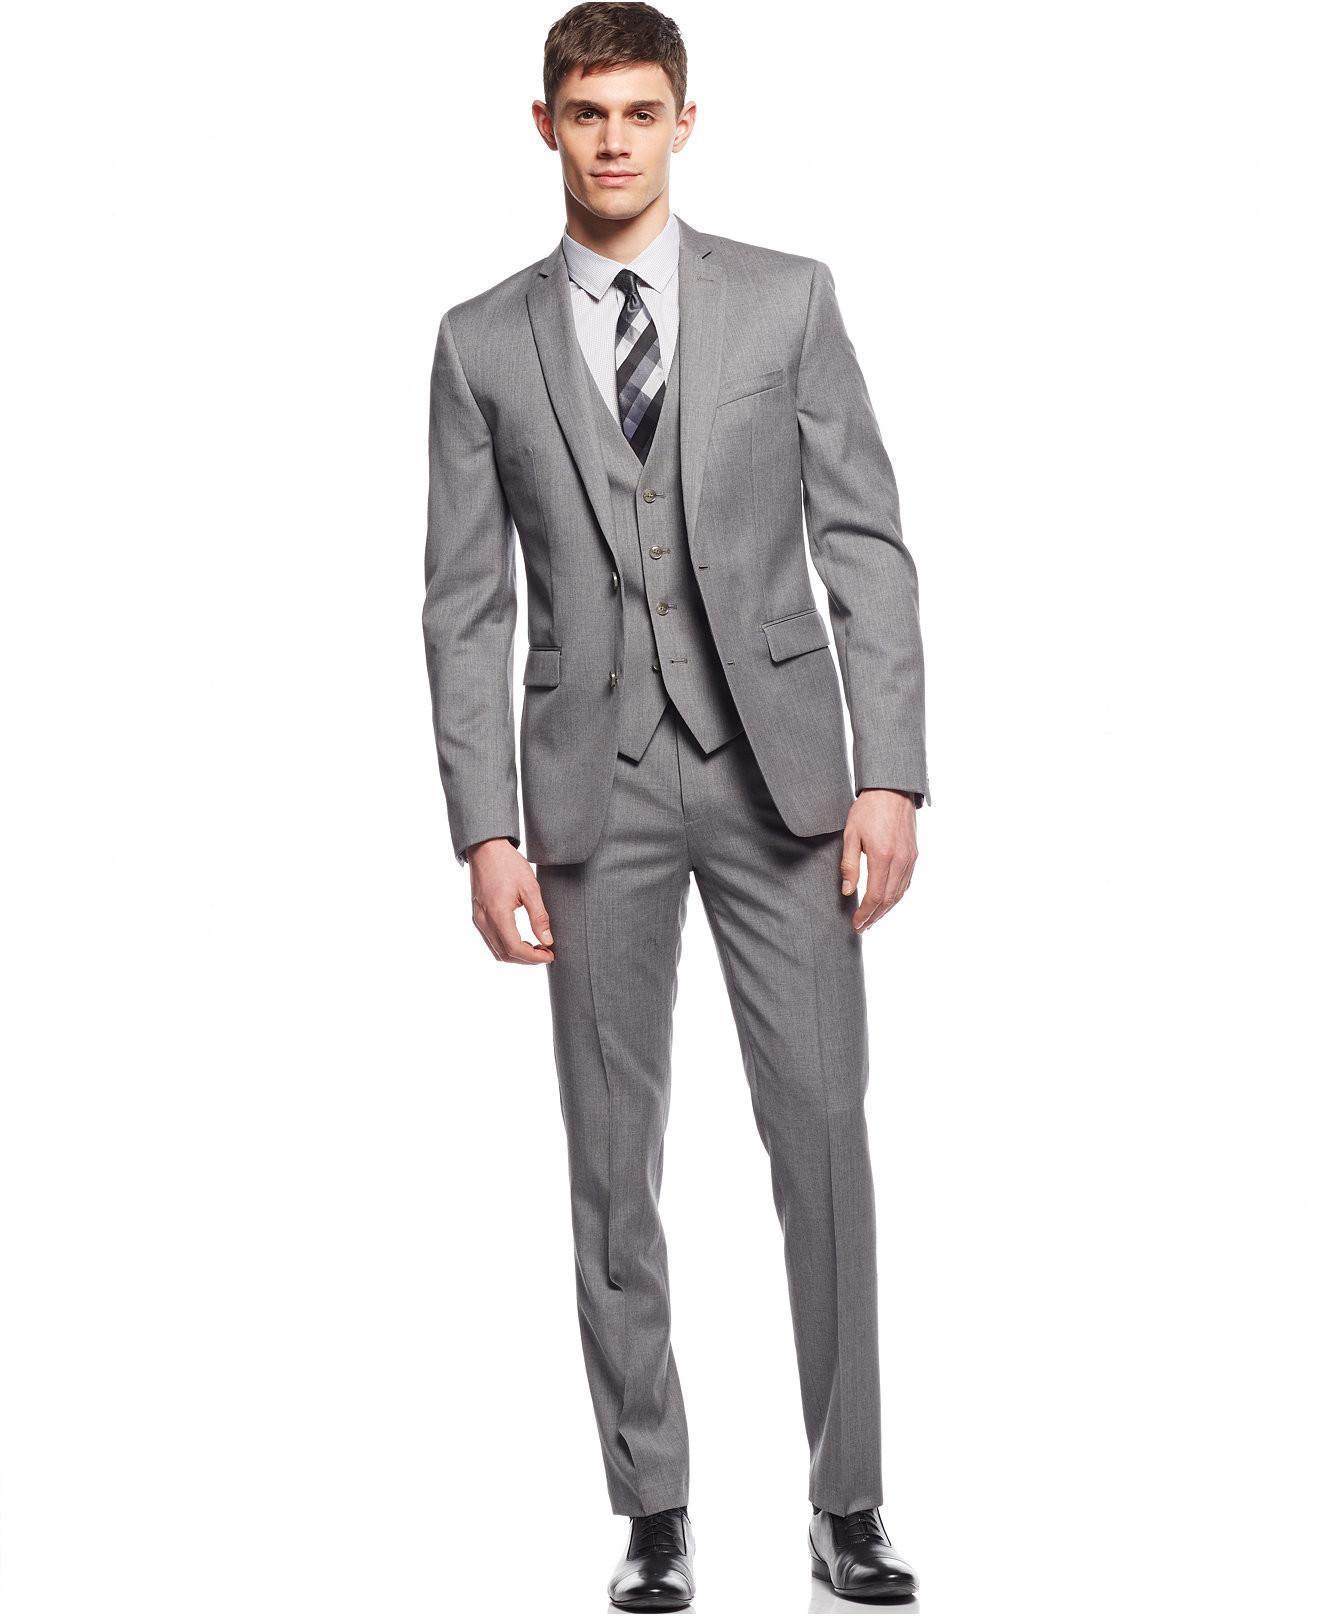 Wholesale - The latest fashion three-piece suit light grey suit custom groom wedding suit of high quality best man suit jacket + pants